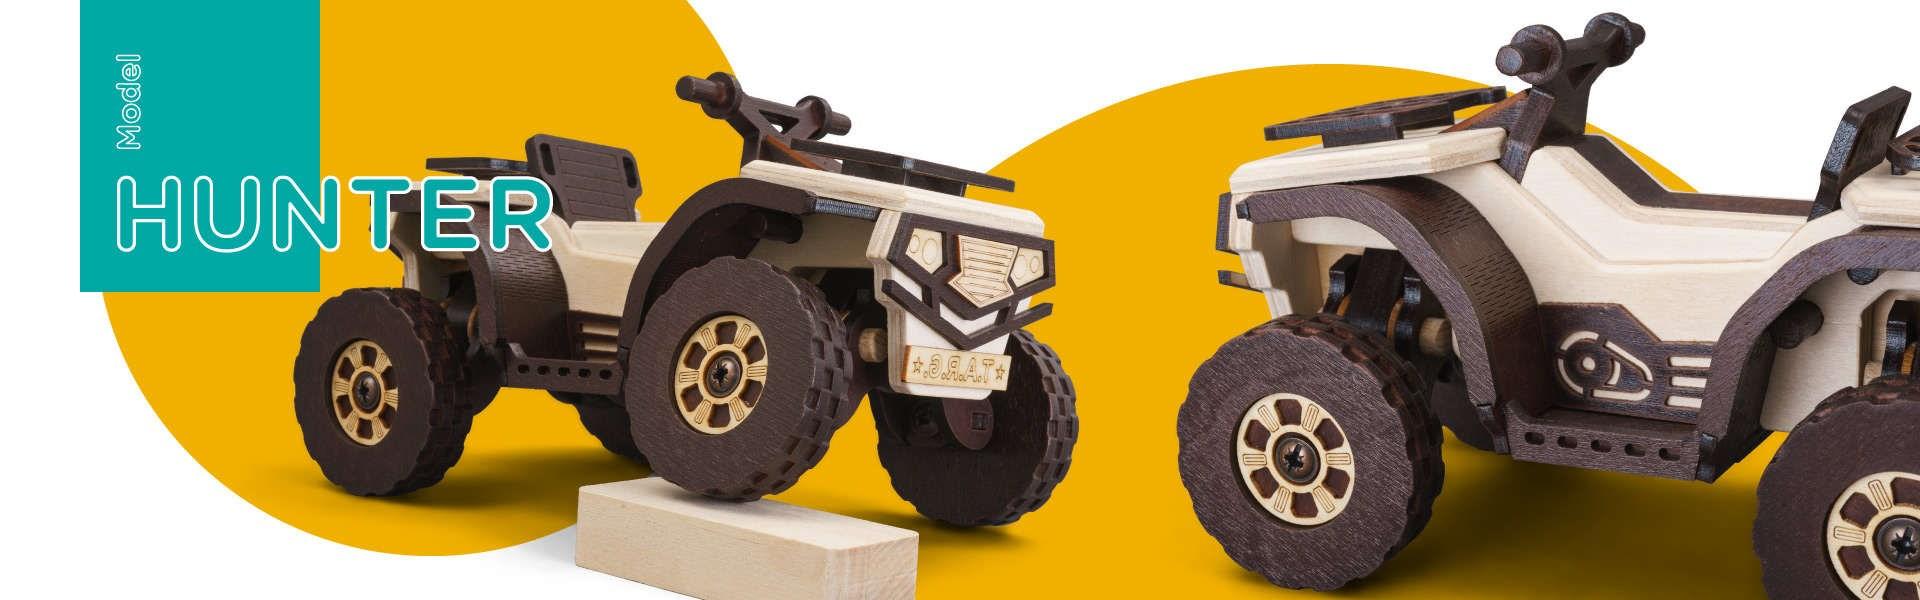 Сборная модель T.A.R.G. Hunter. Квадроцикл - фото 4977